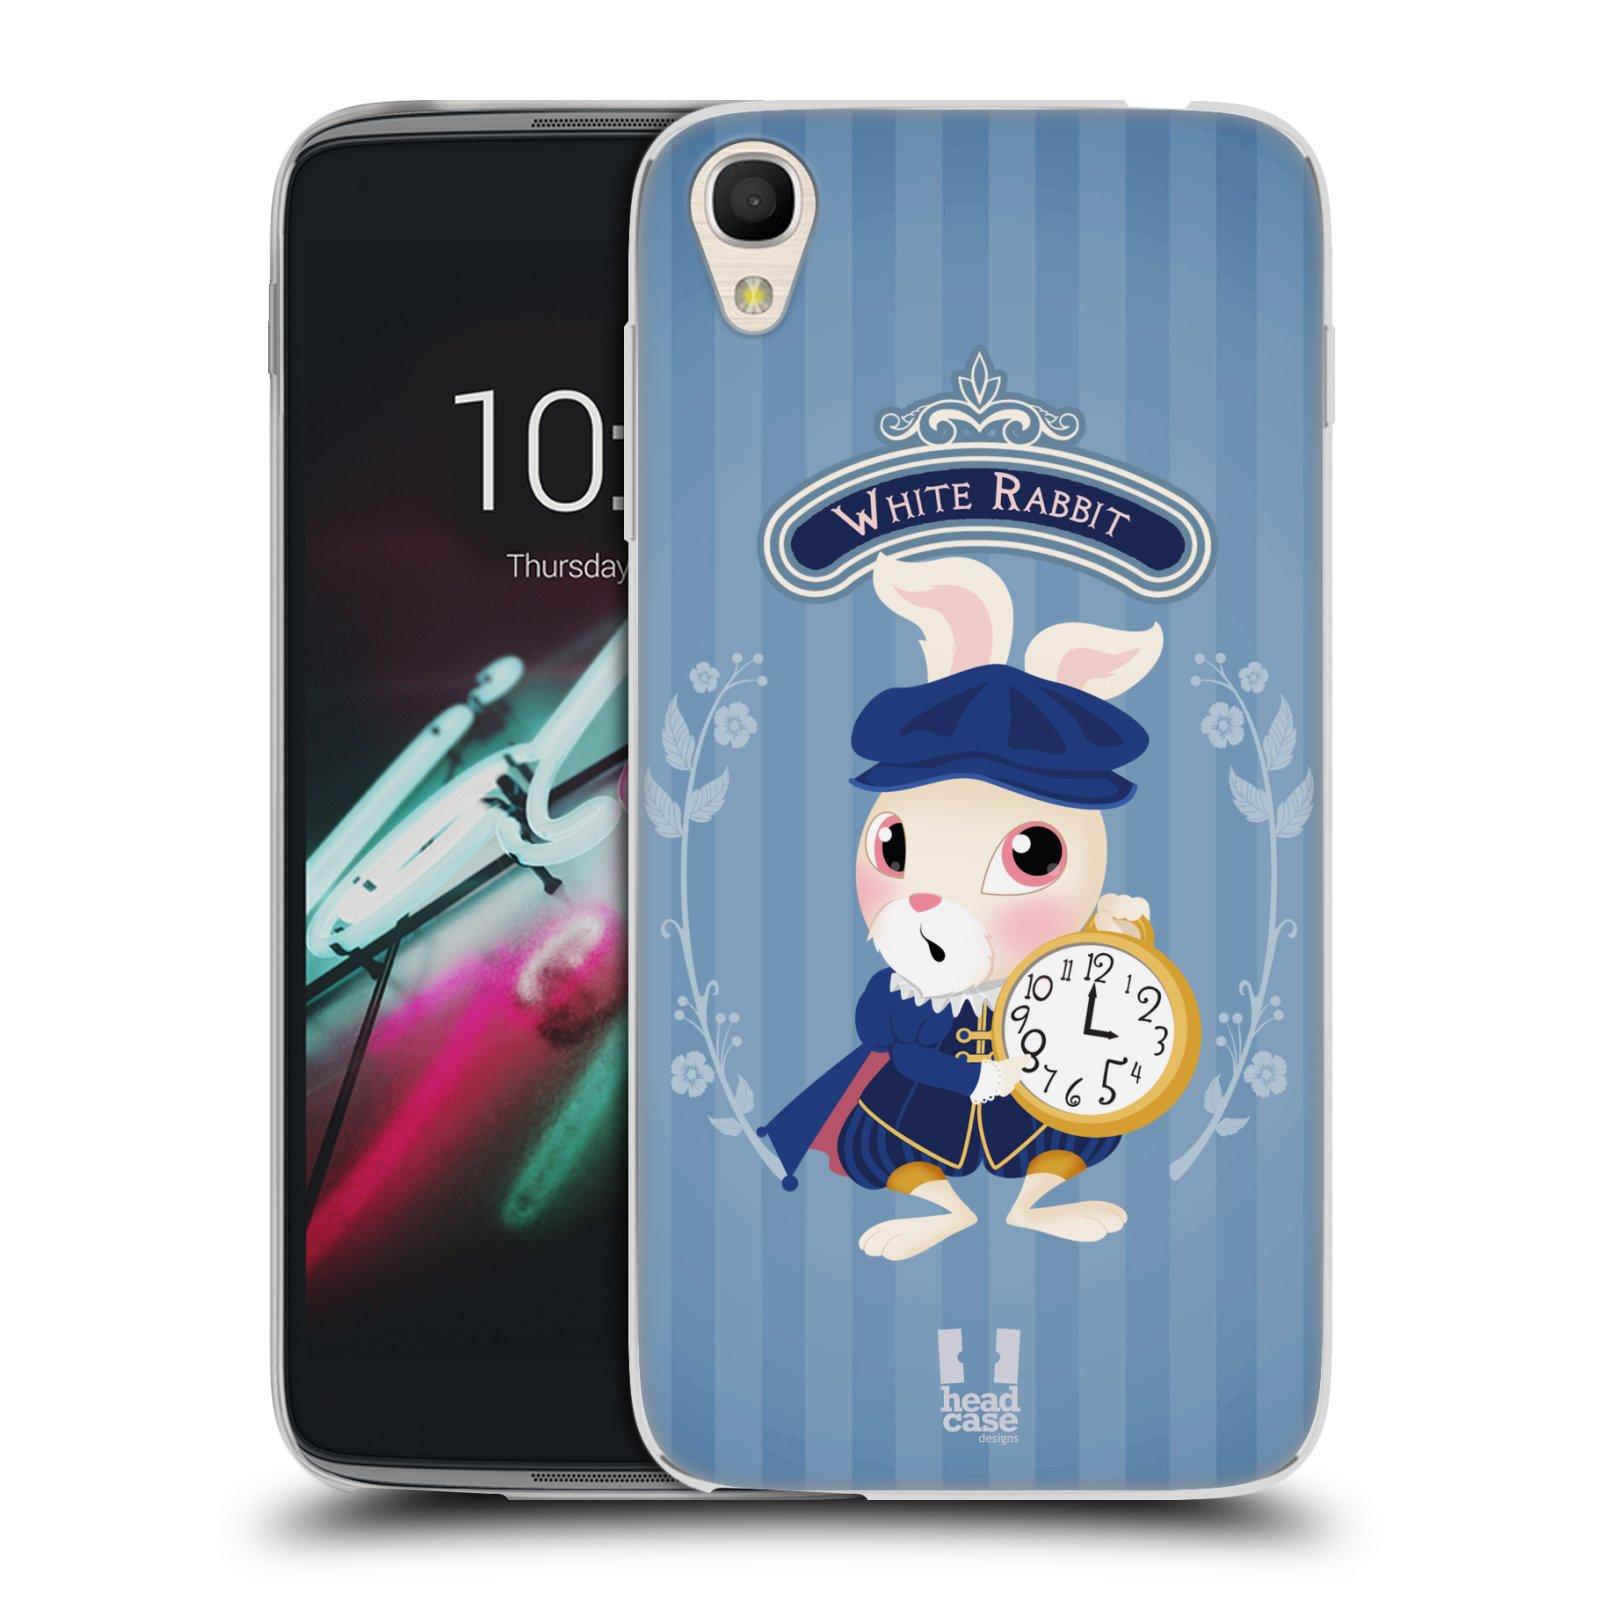 HEAD CASE silikonový obal na mobil Alcatel Idol 3 OT-6039Y (4.7) vzor Alenka v říši divů králíček